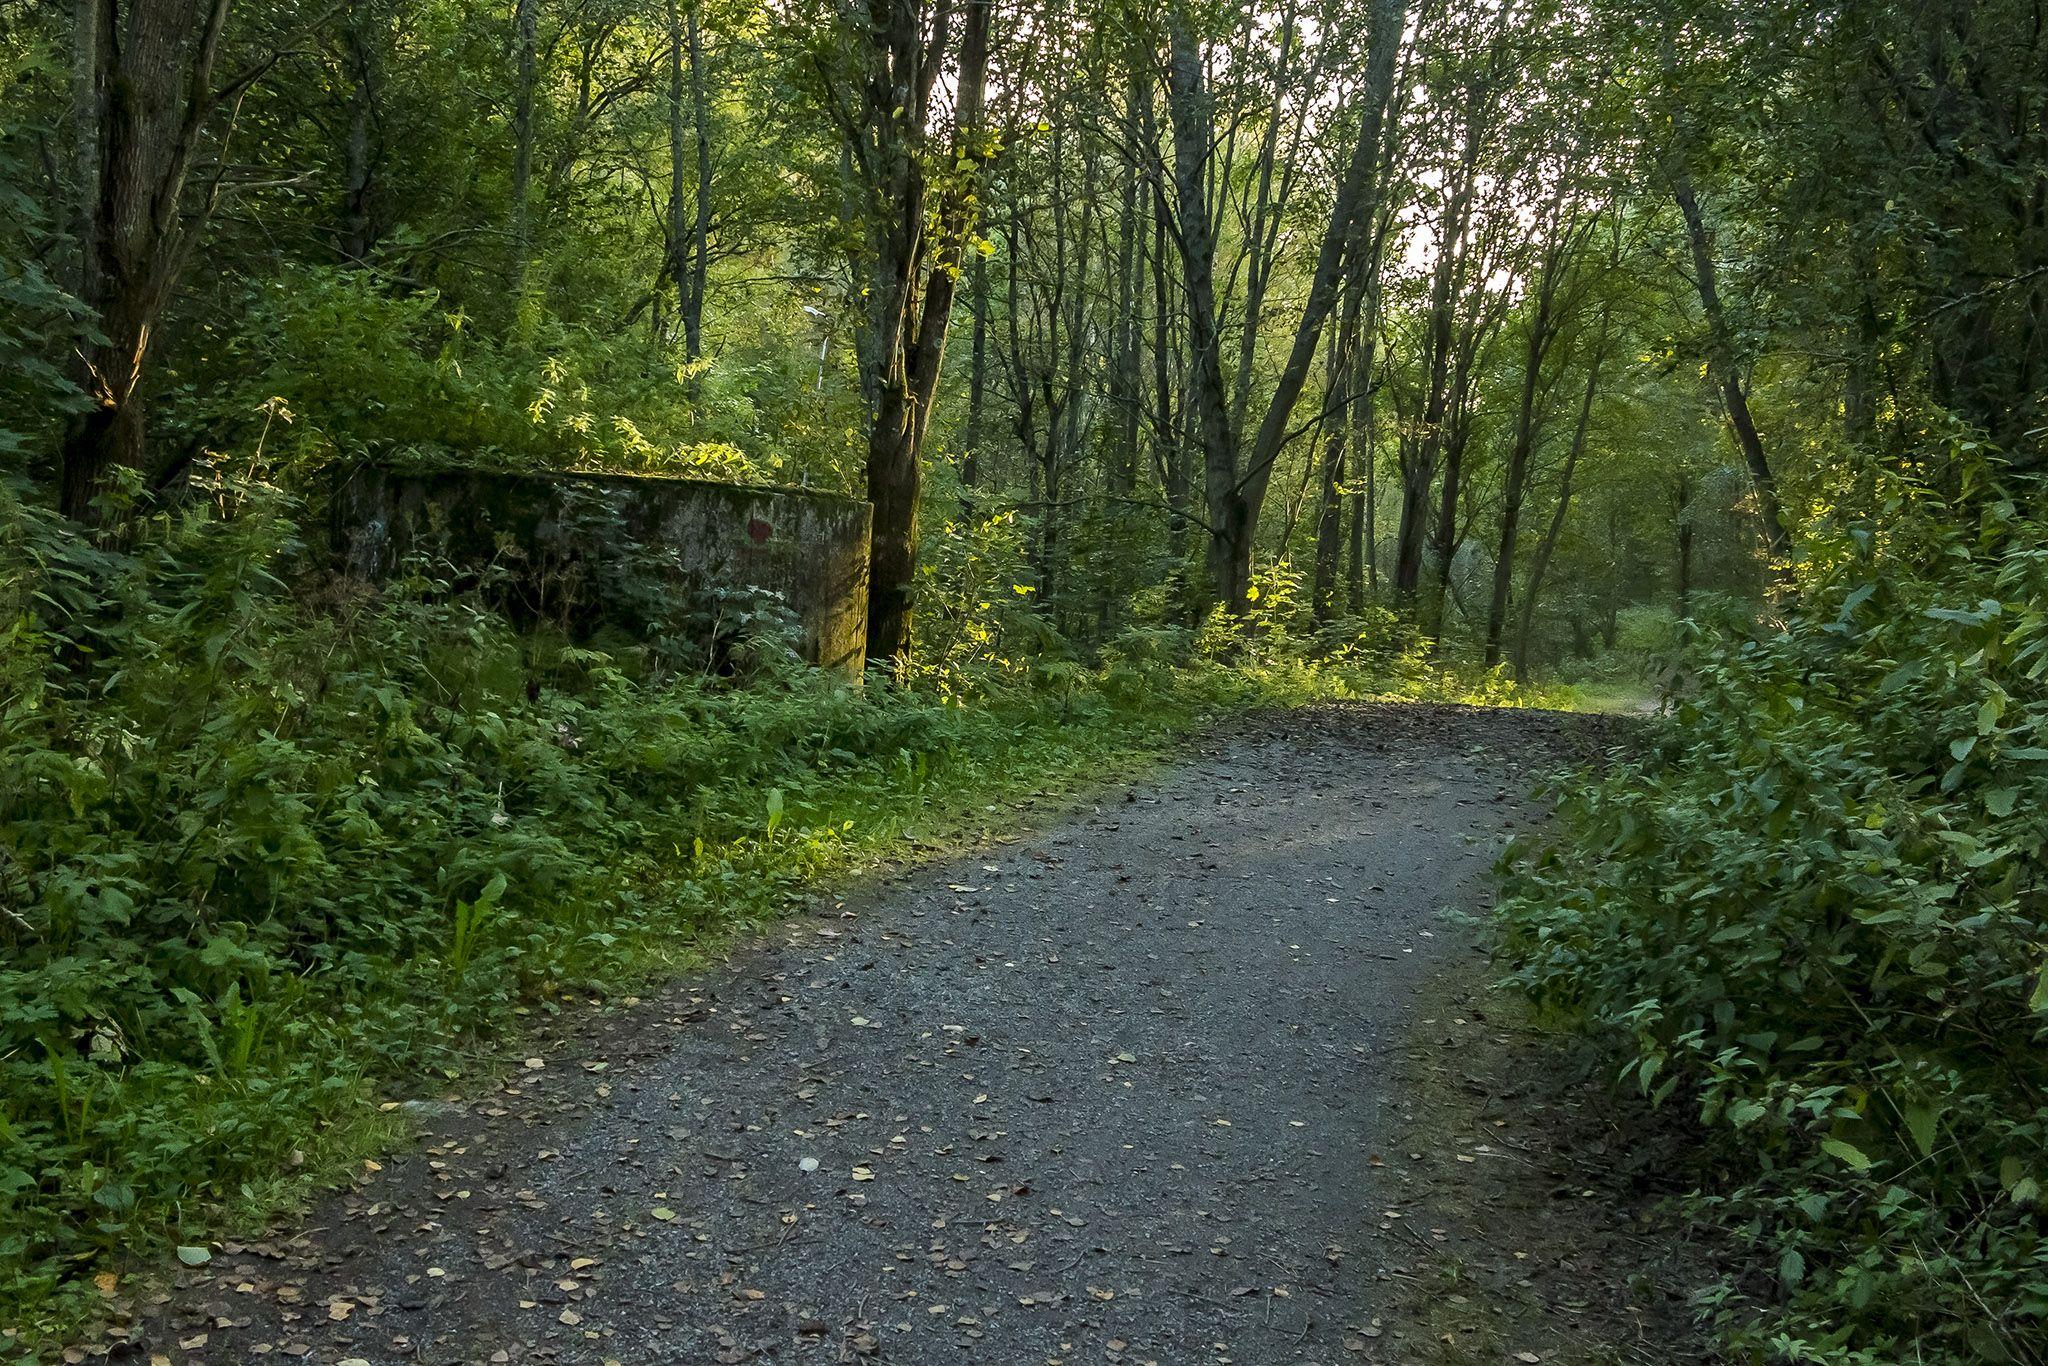 Forest Trail by Harri Hedman